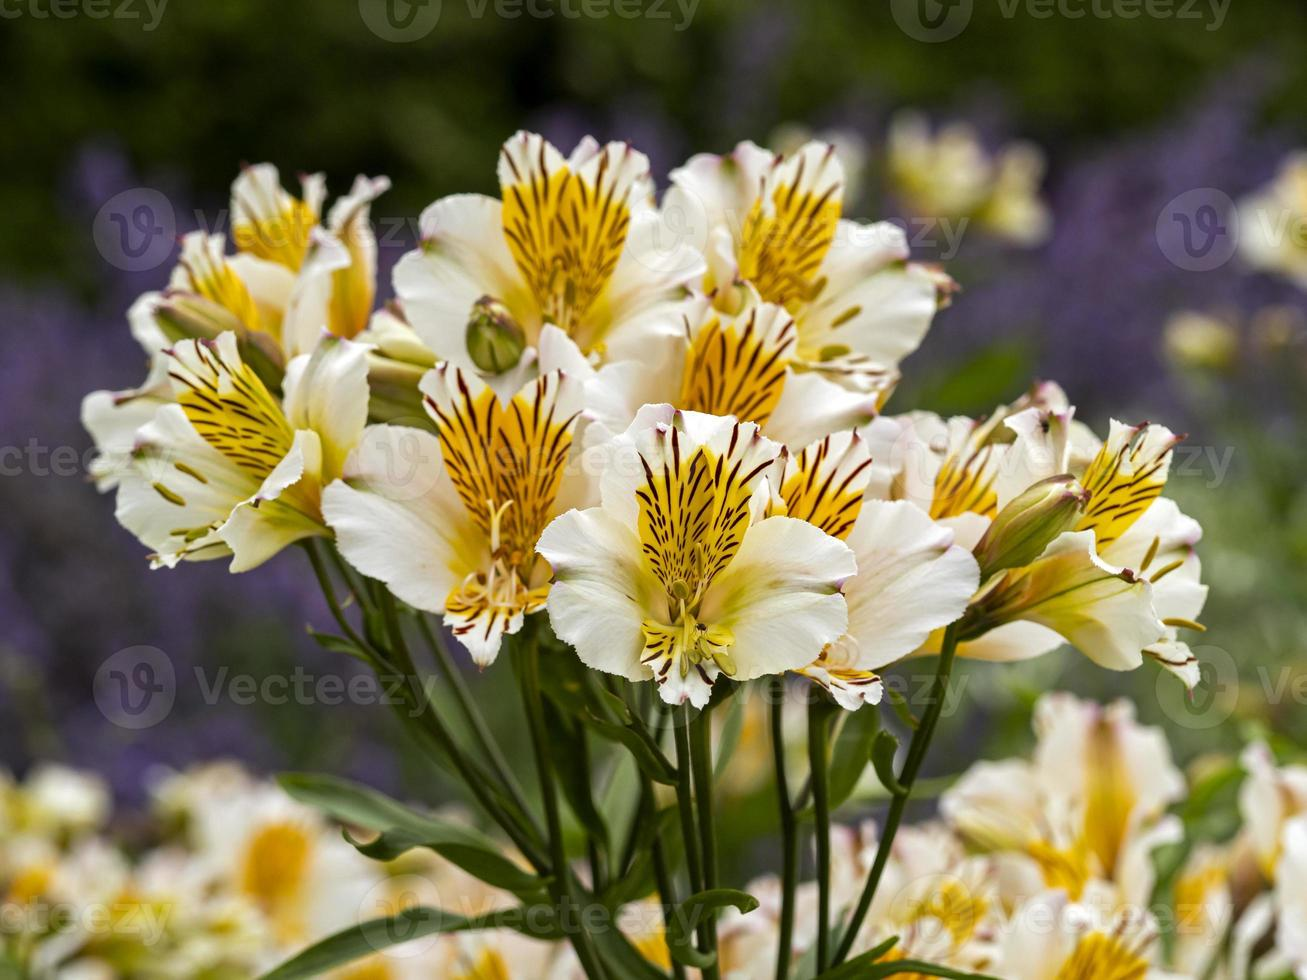 gigli peruviani alstroemeria bianchi e gialli foto